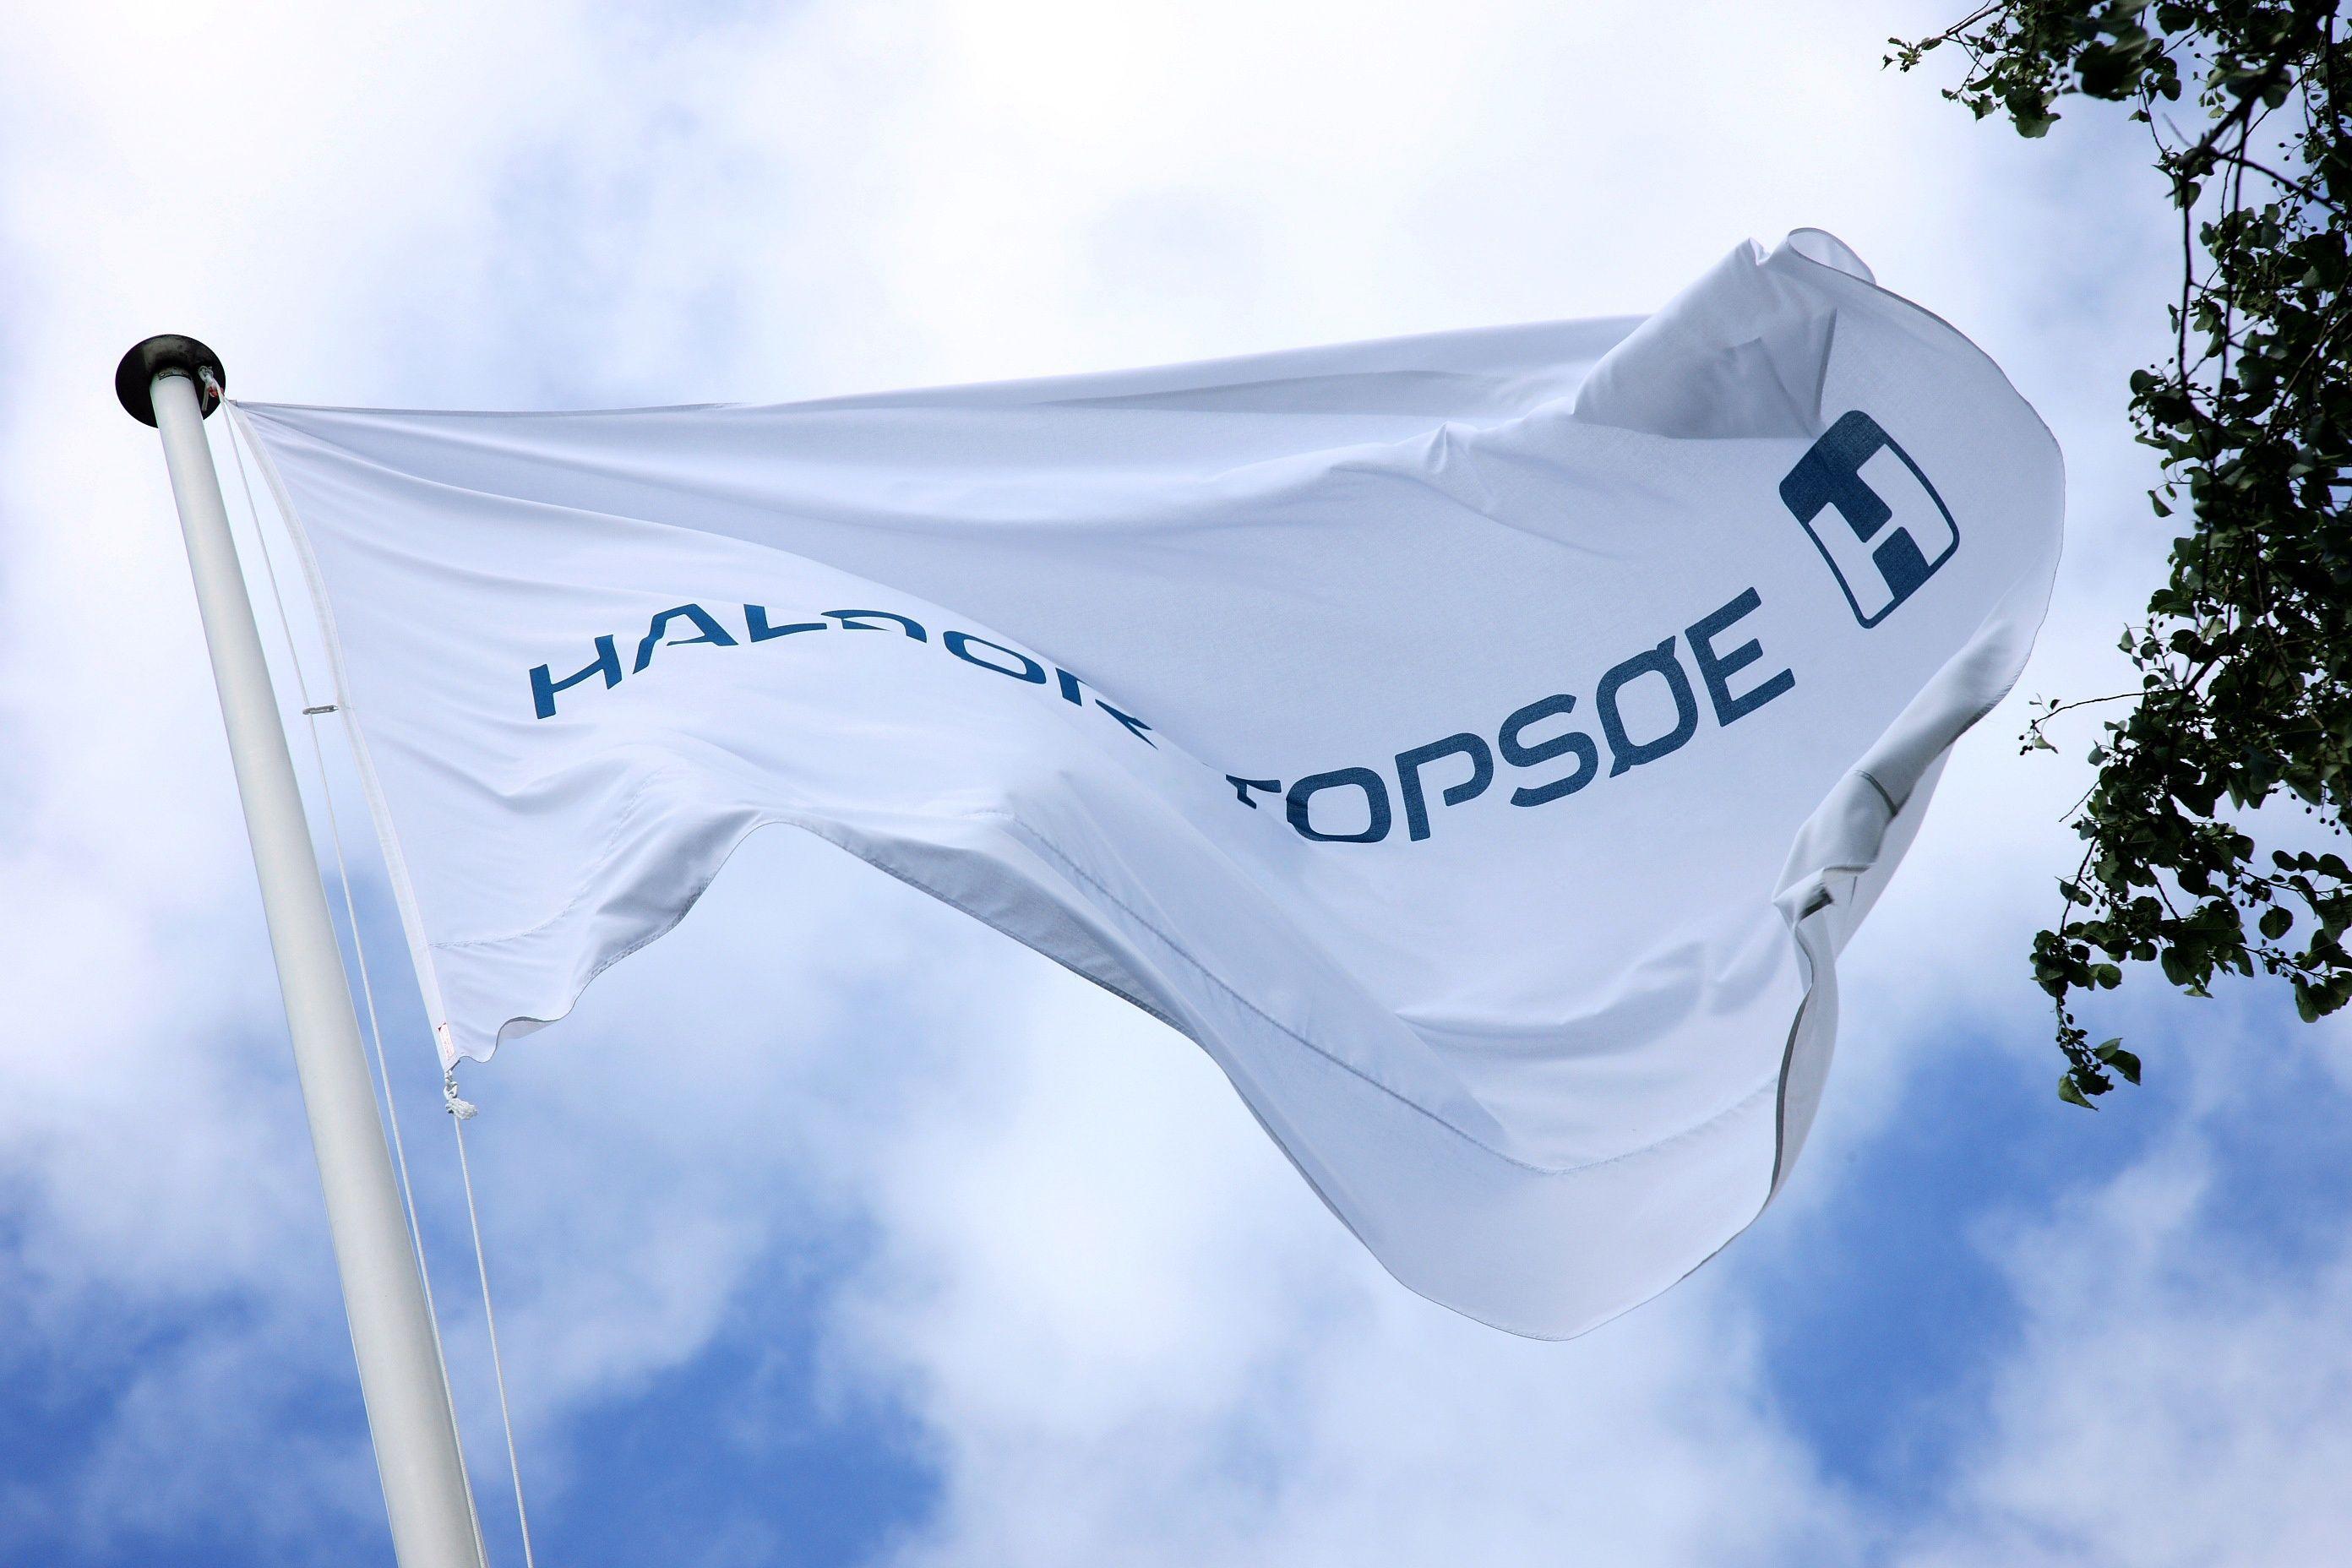 Haldor Topsoe's flag